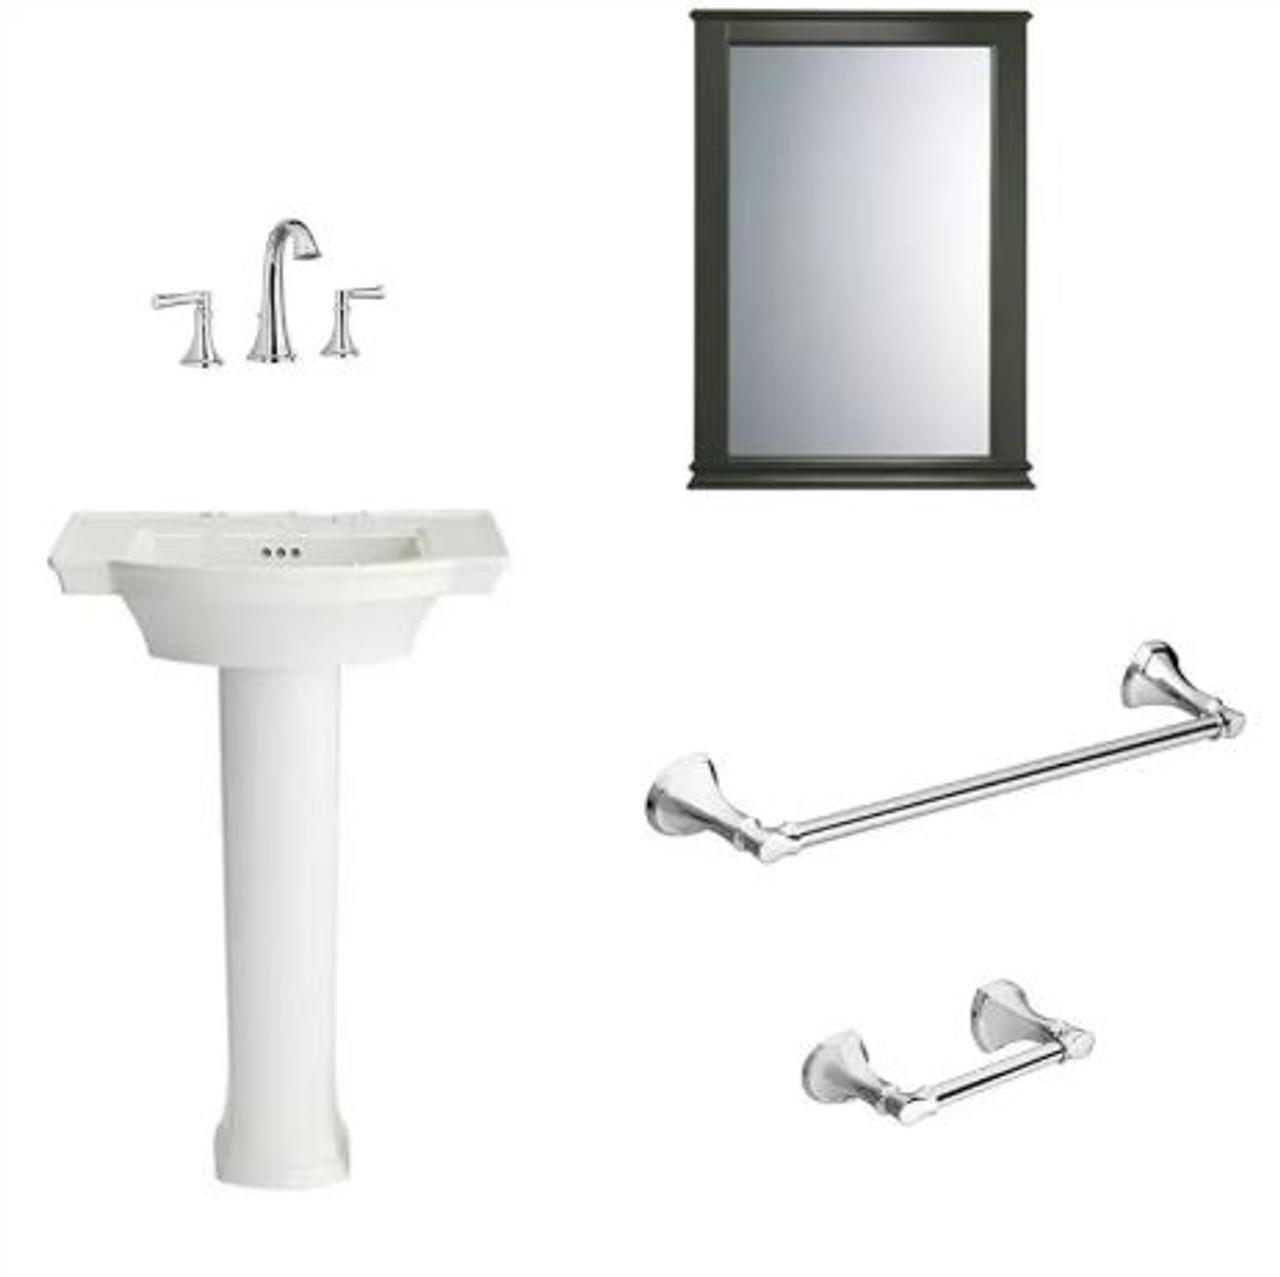 American Standard Estate Bathroom Package With 24 Pedestal Sink Widespread Bathroom Faucet Toilet Paper Holder 18 Towel Bar And Portsmouth Poplar Framed Mirror Royal Bath Place